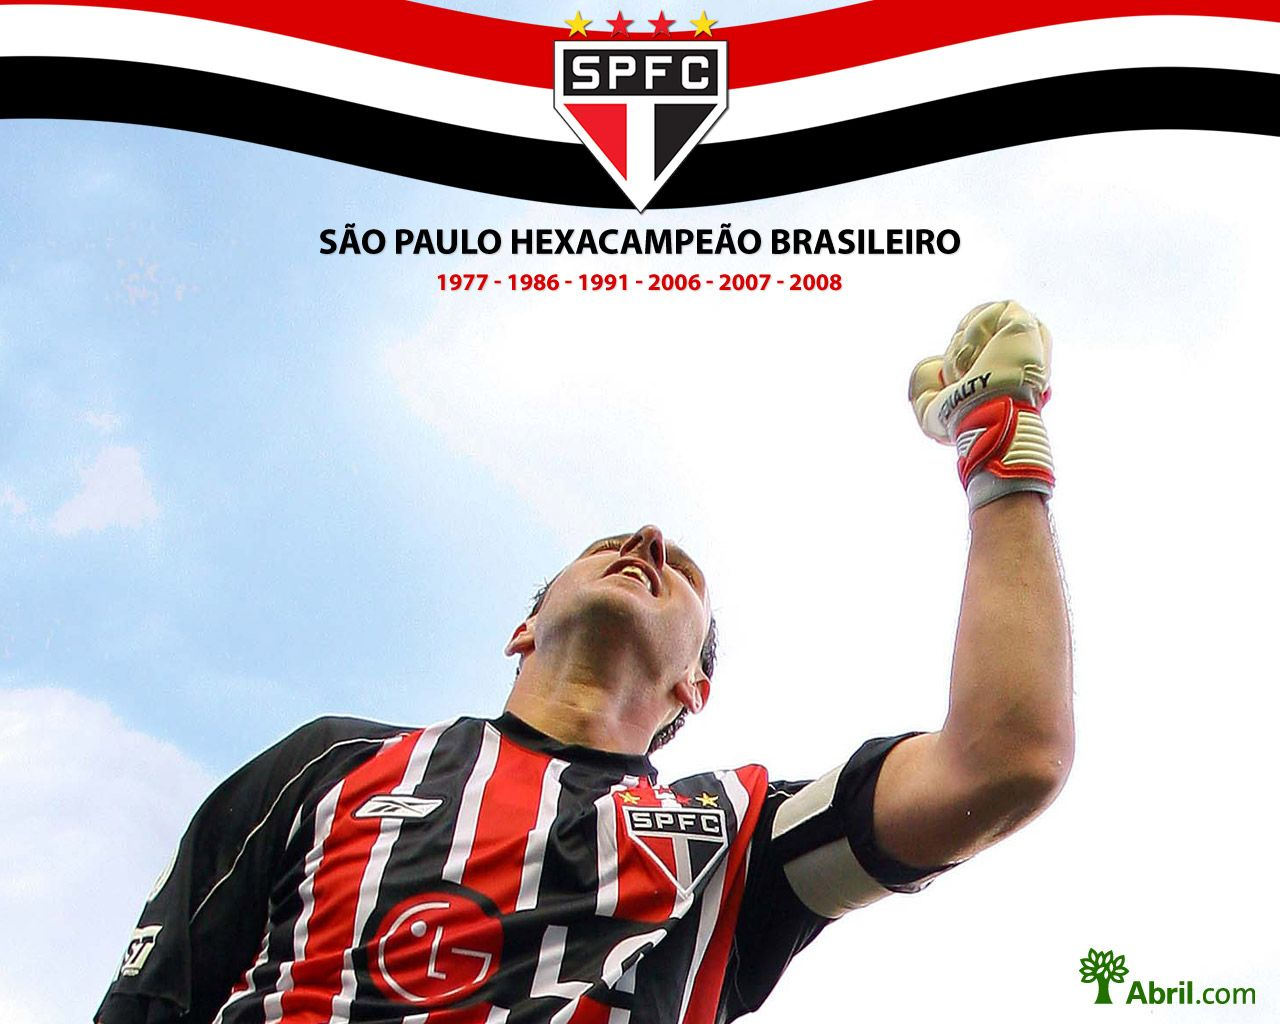 HEXA+TRI São paulo futebol clube, São paulo, São paulo